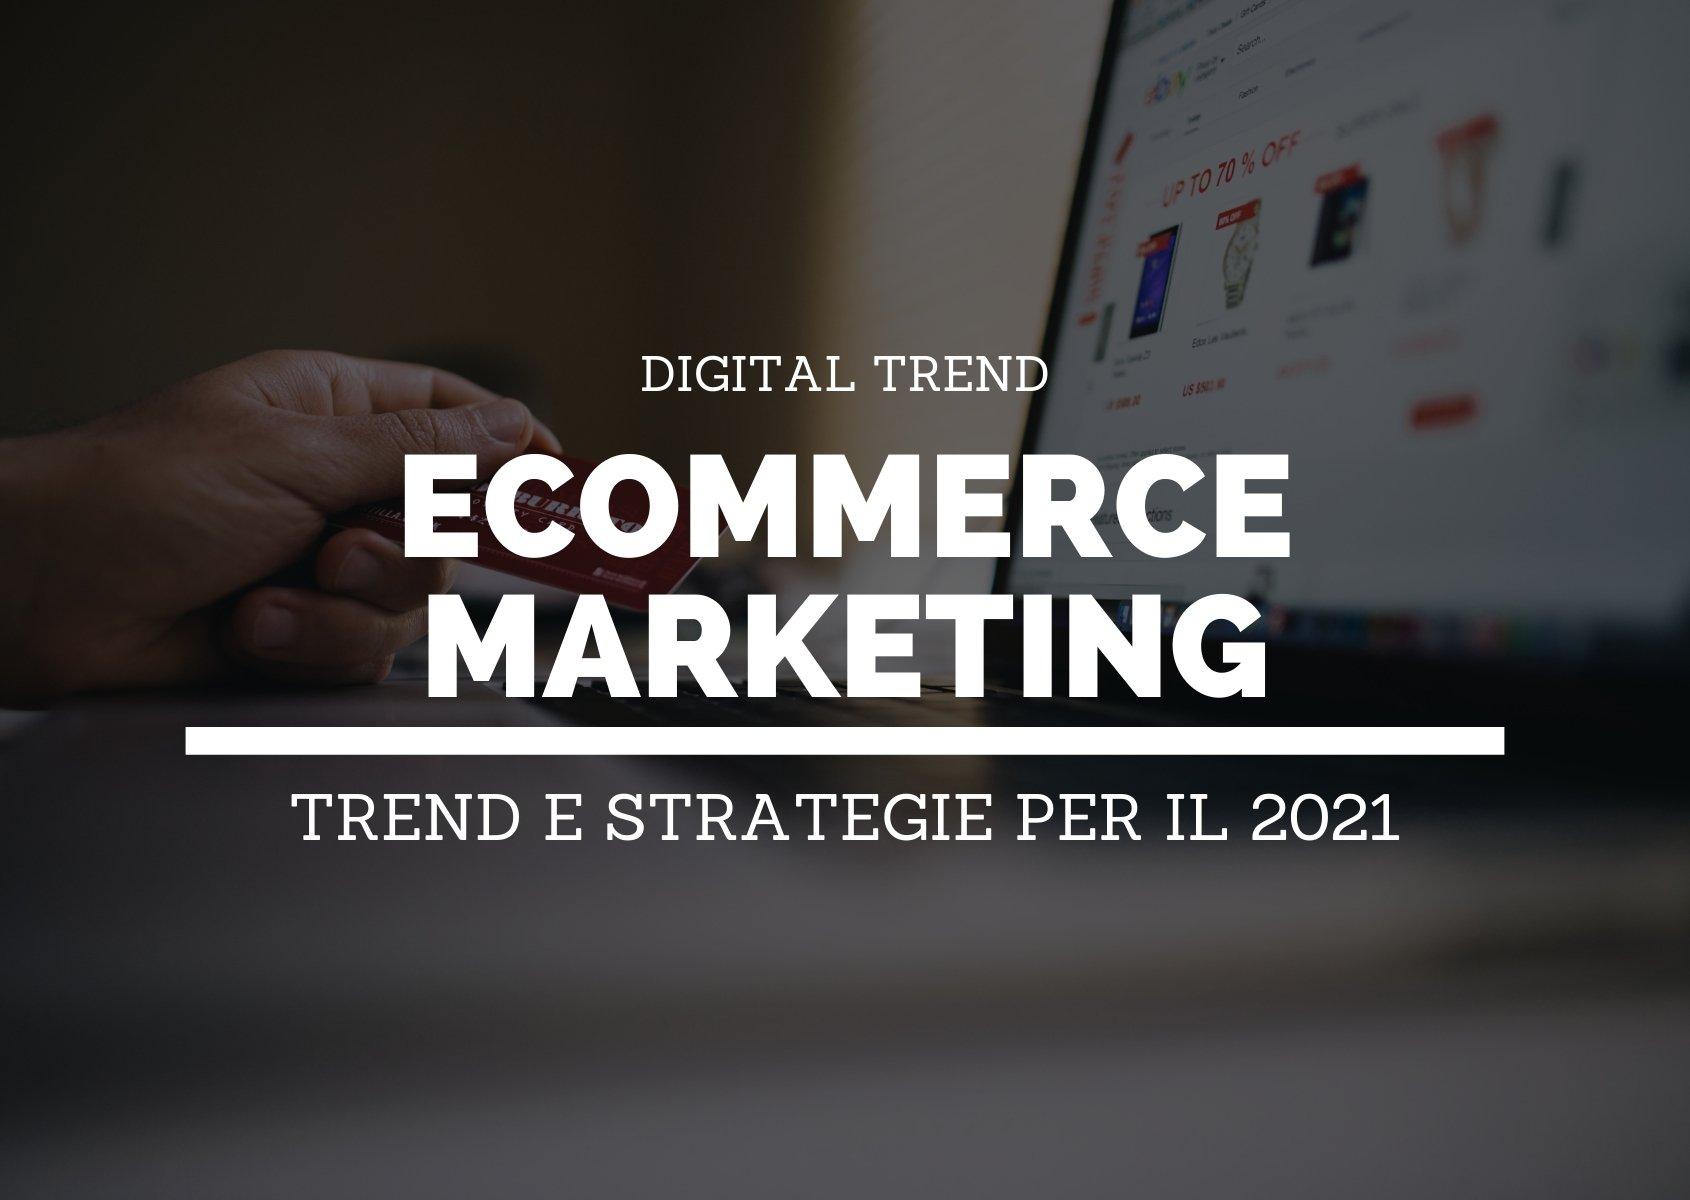 Ecomemrce-trend-2021-header